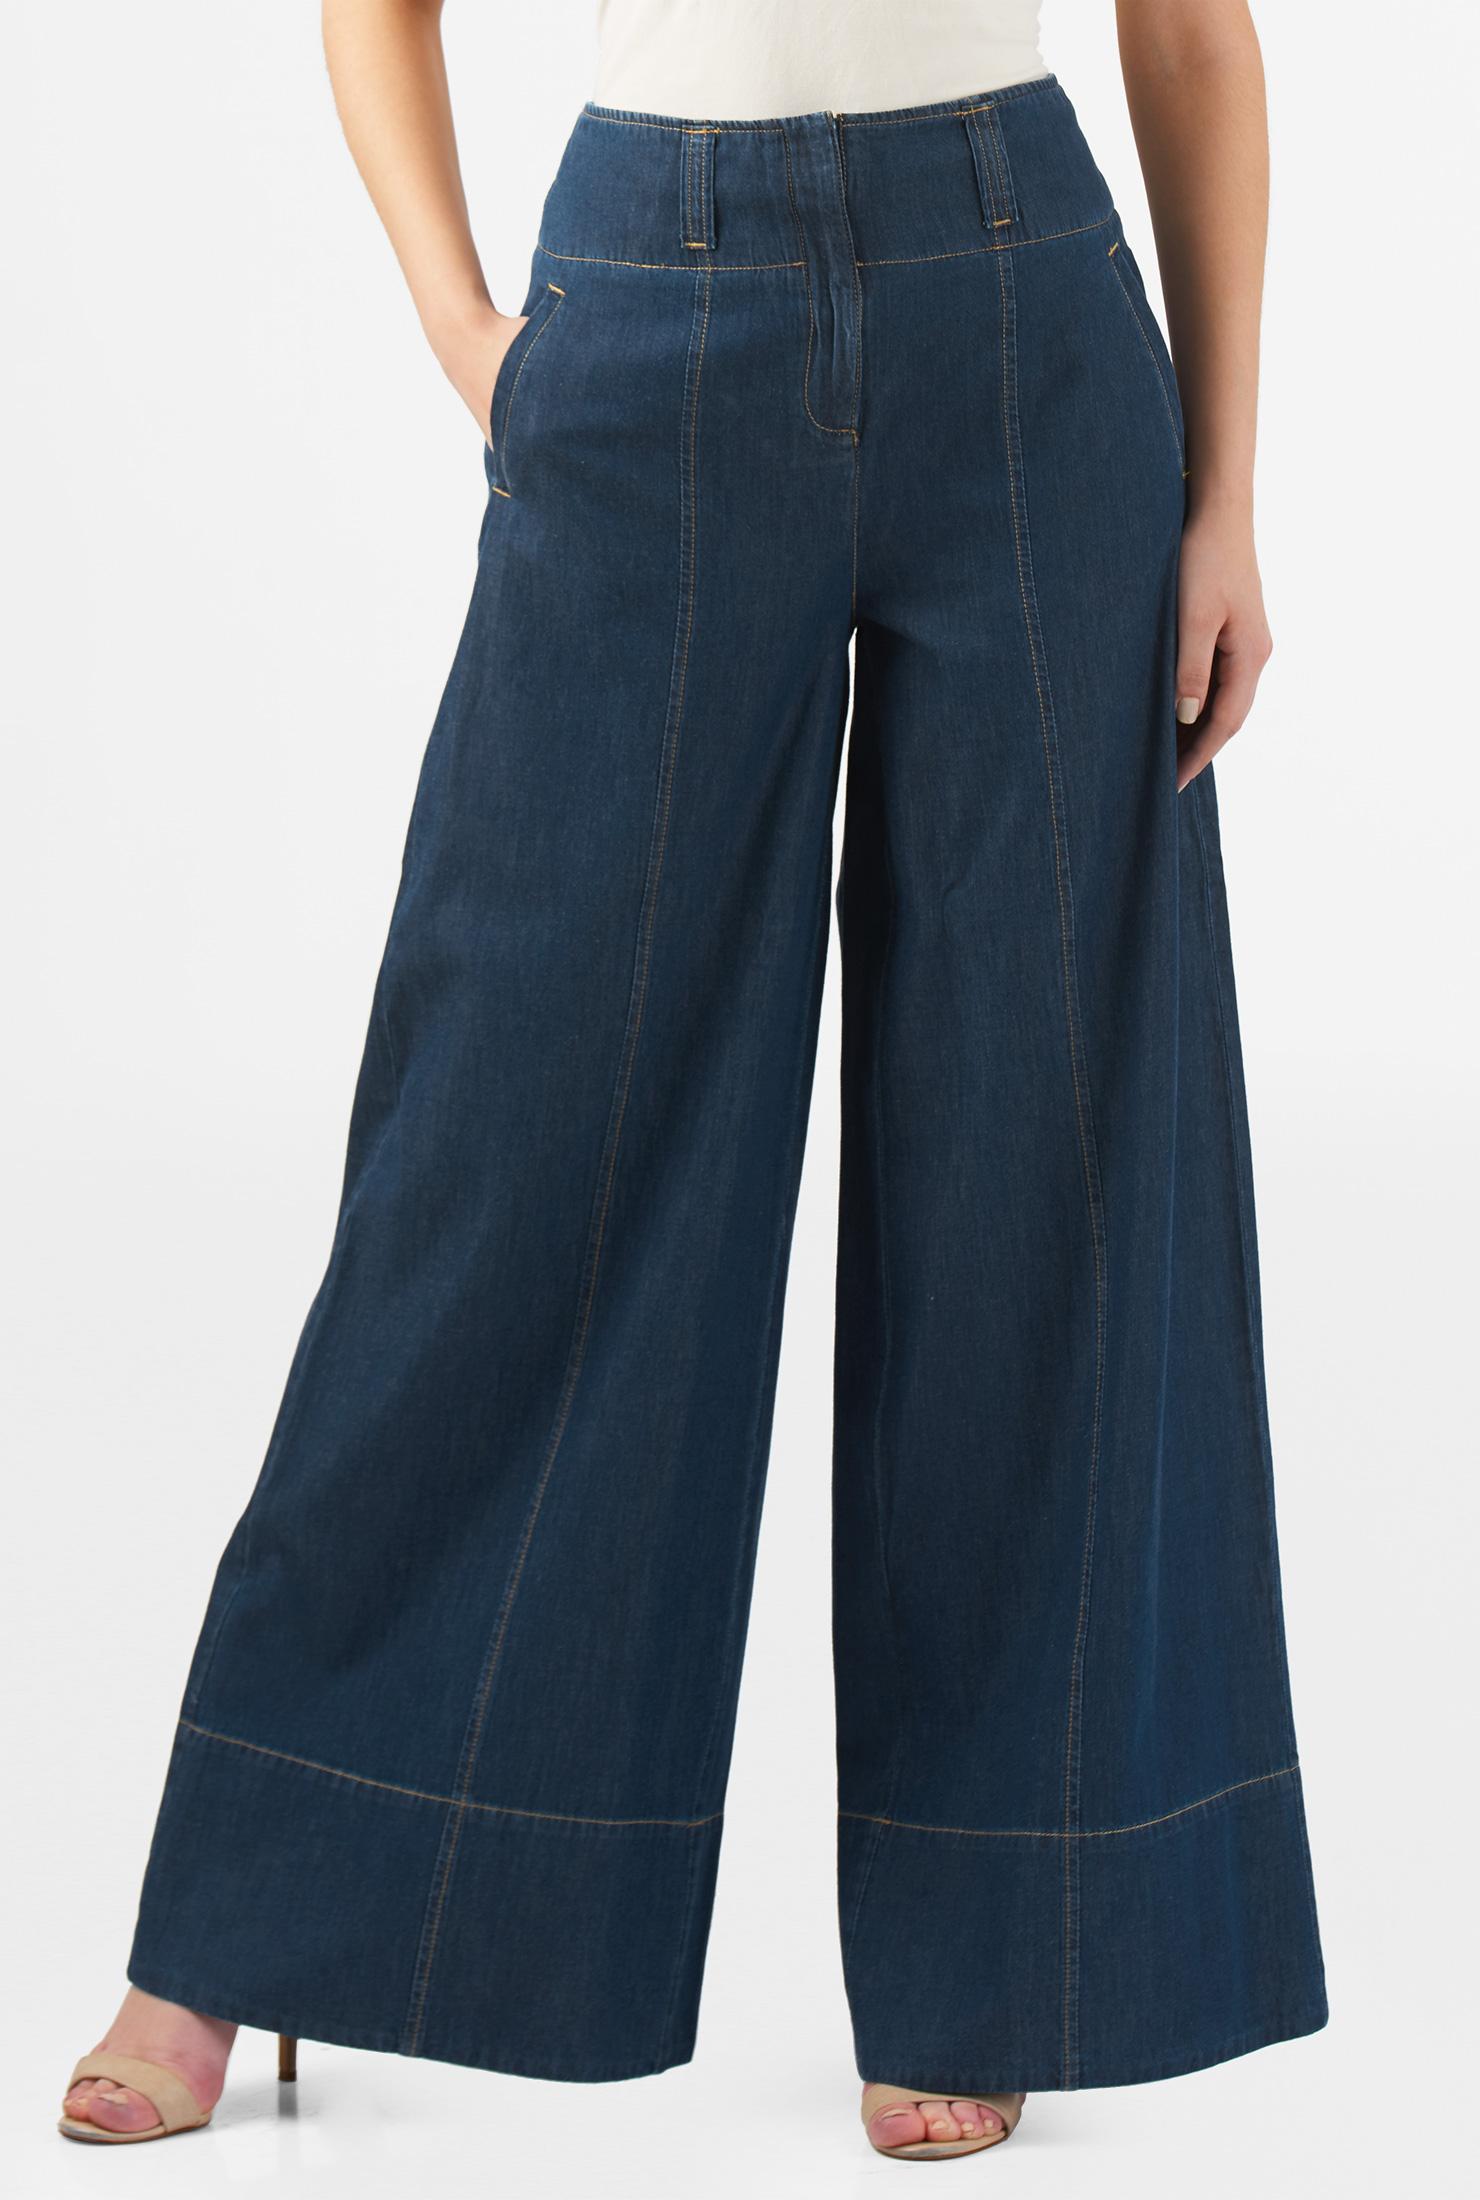 super popular 05412 05734 Deep indigo cotton denim palazzo pants